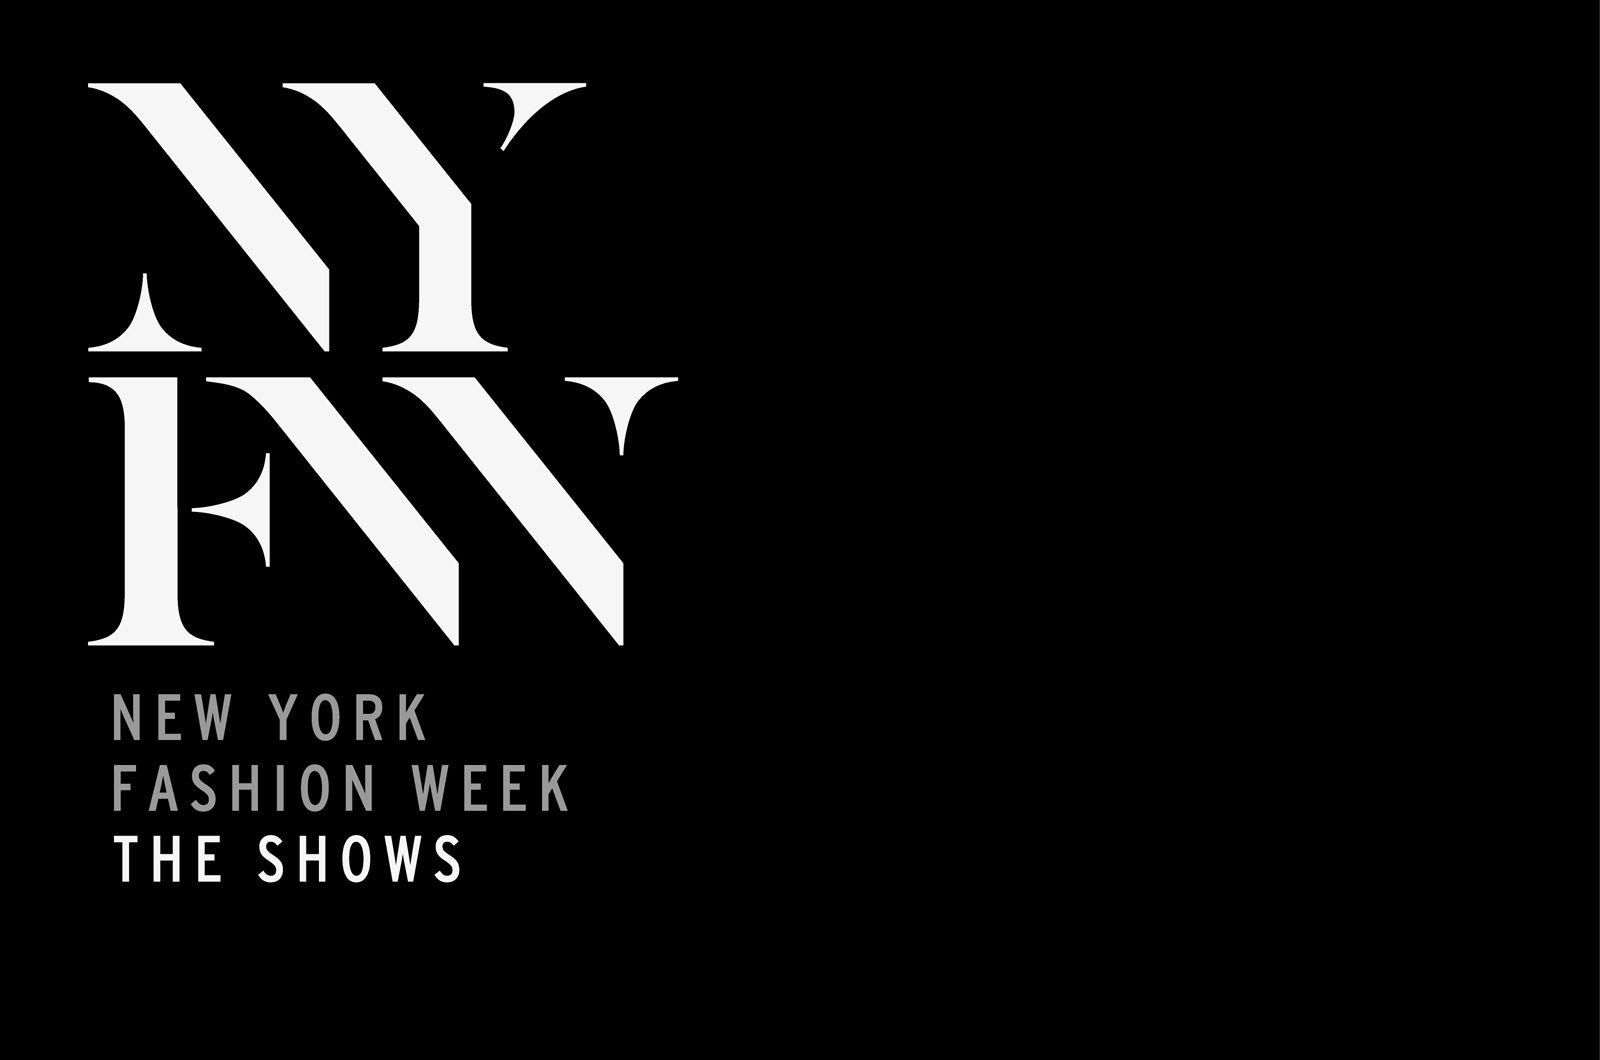 Mother Design New York Fashion Week New York Fashion New York Fashion Week Fashion Week